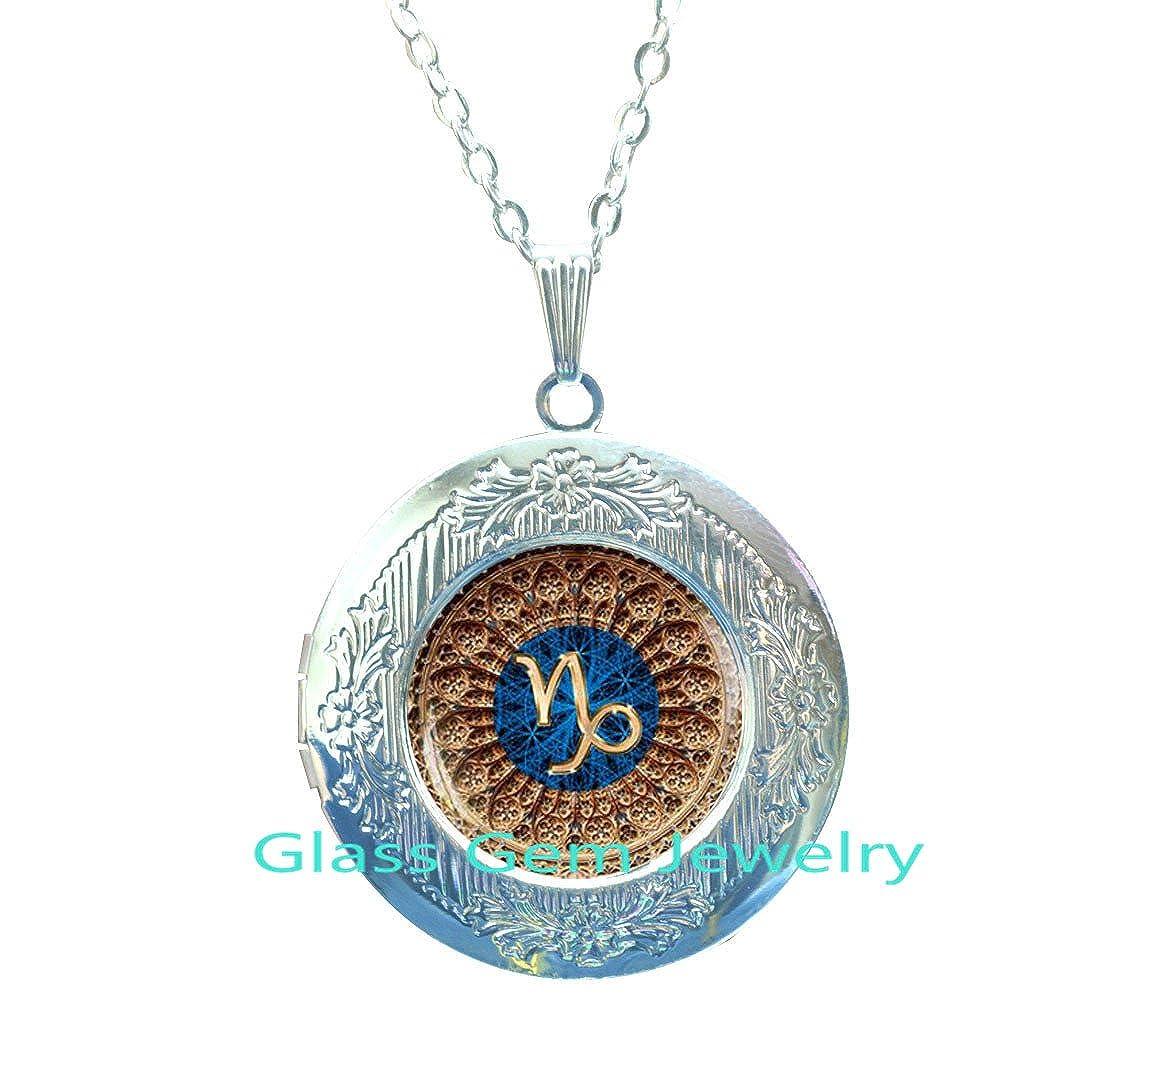 Zodiac Sign,Q0108 Capricorn constellation Locket Necklace Capricorn Zodiac Locket Necklace Capricorn Locket Pendant Capricorn Zodiac Jewelry